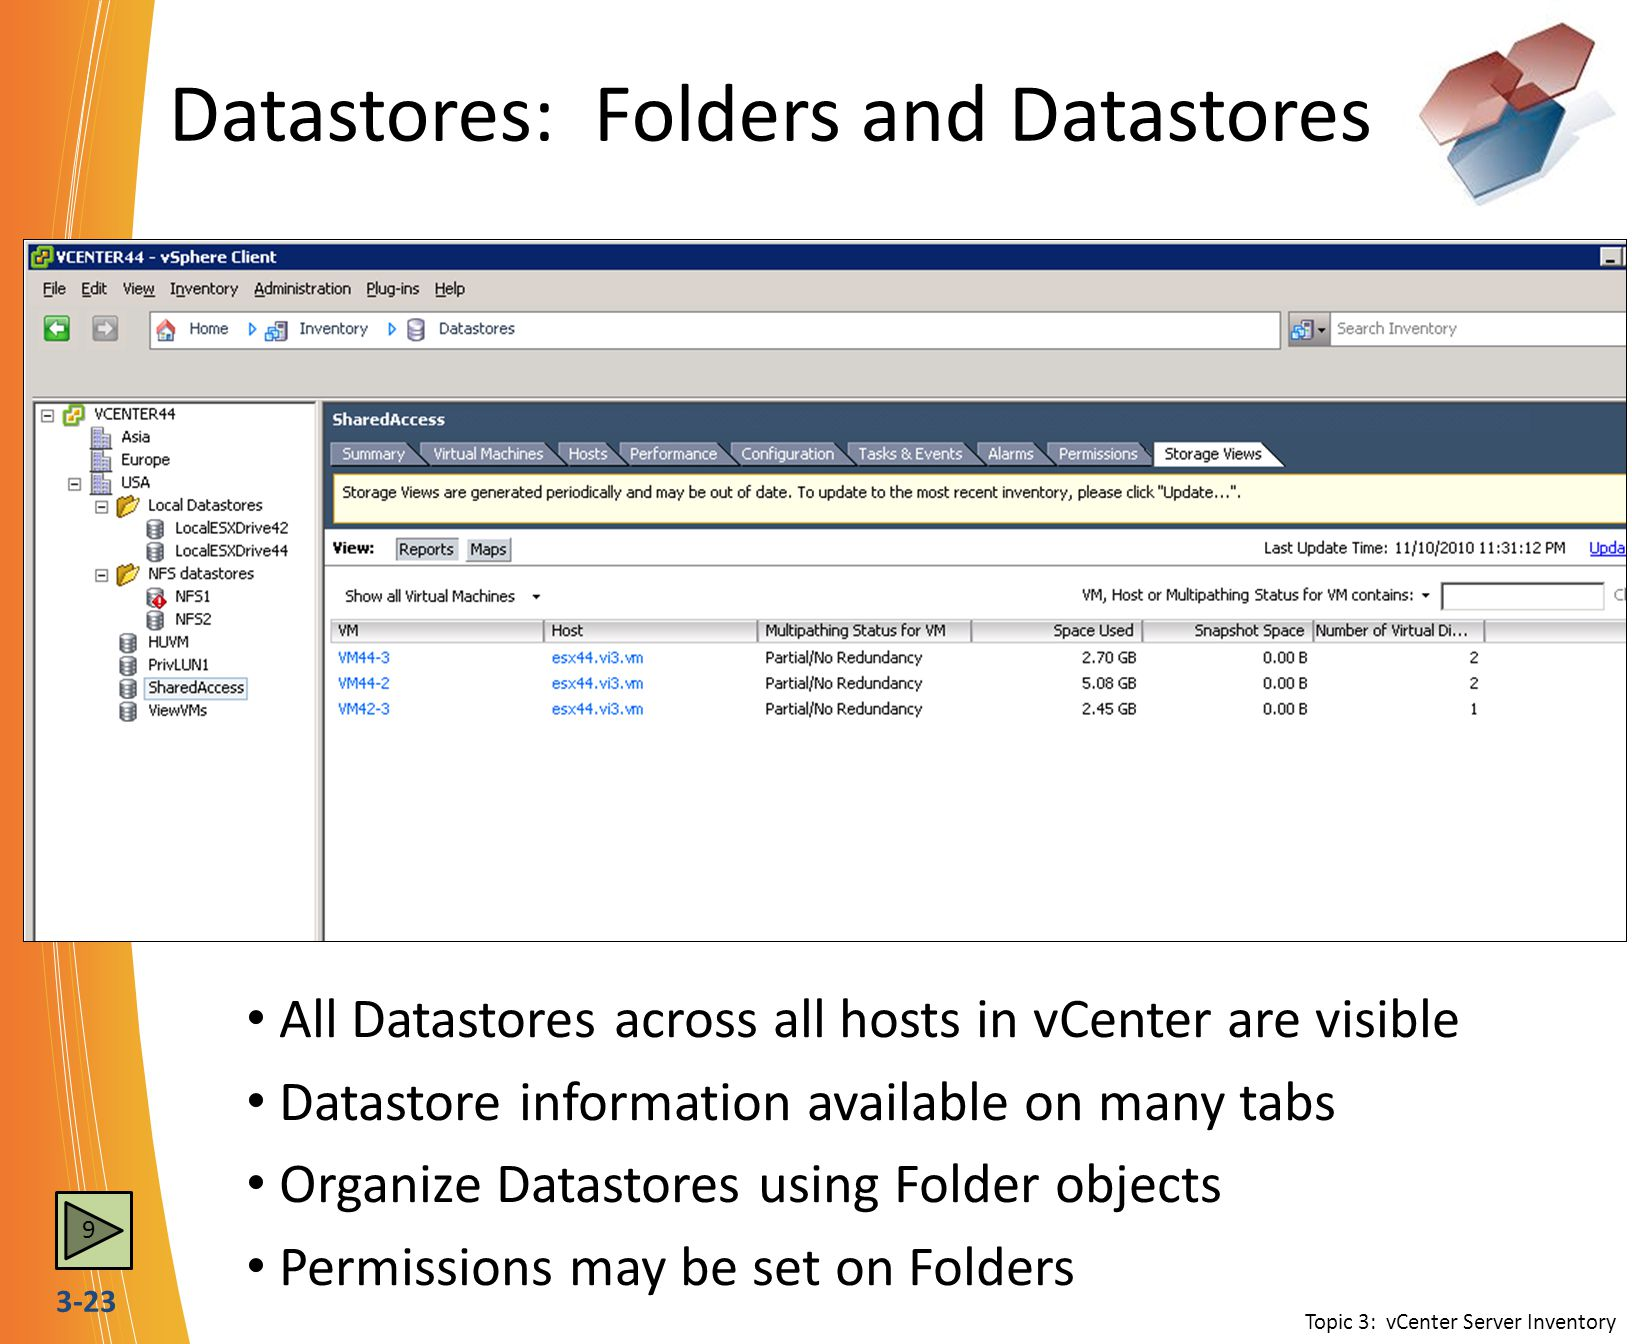 Datastores: Folders and Datastores